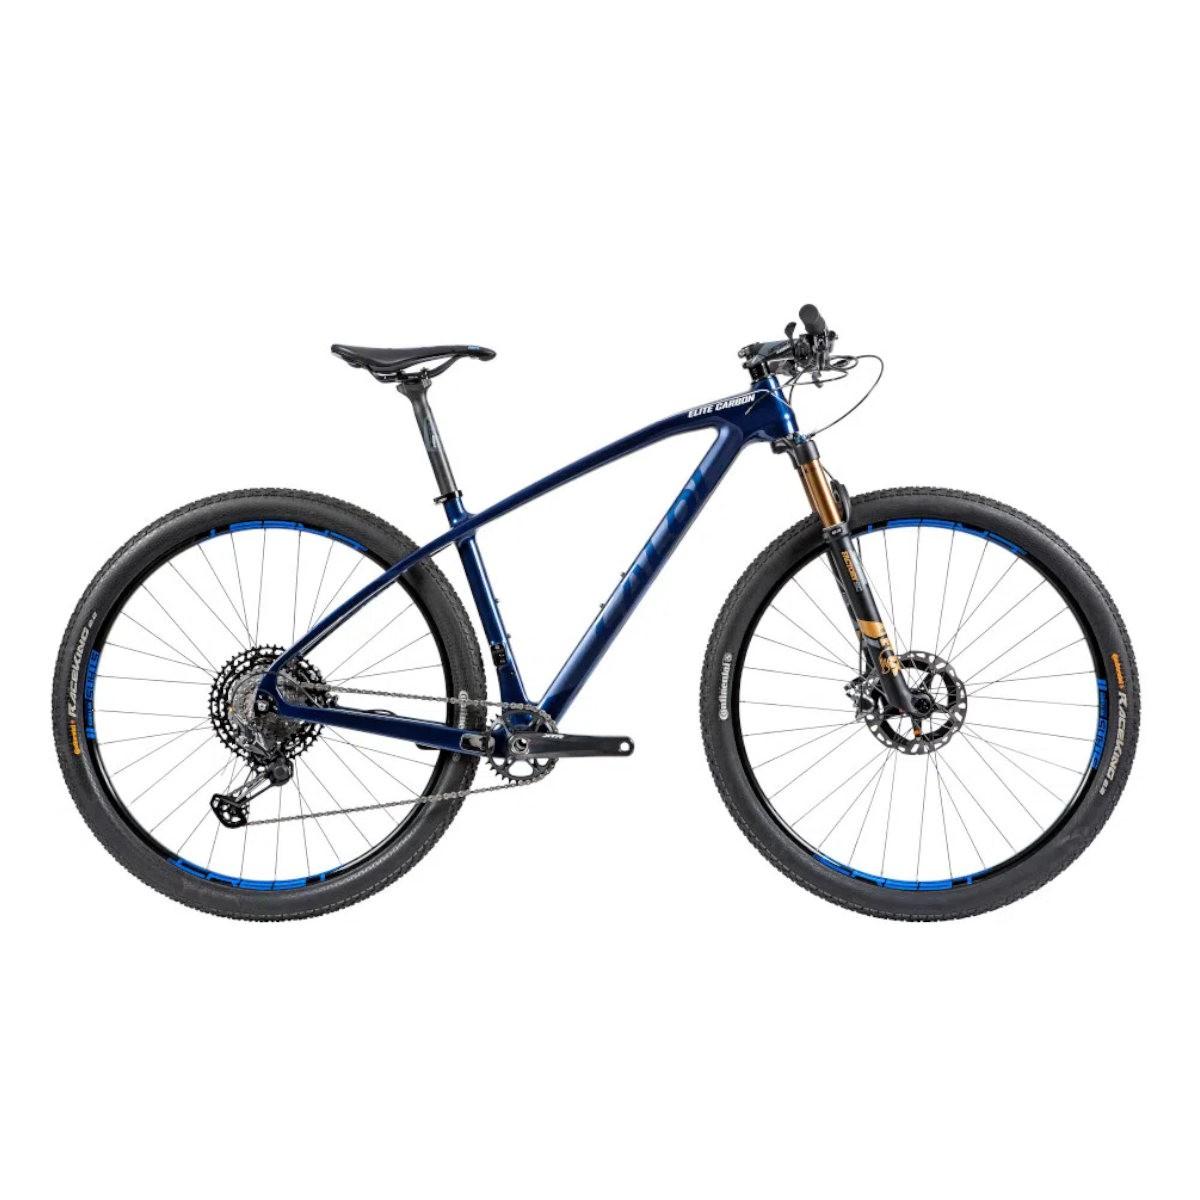 Bicicleta Caloi Elite Carbon Team